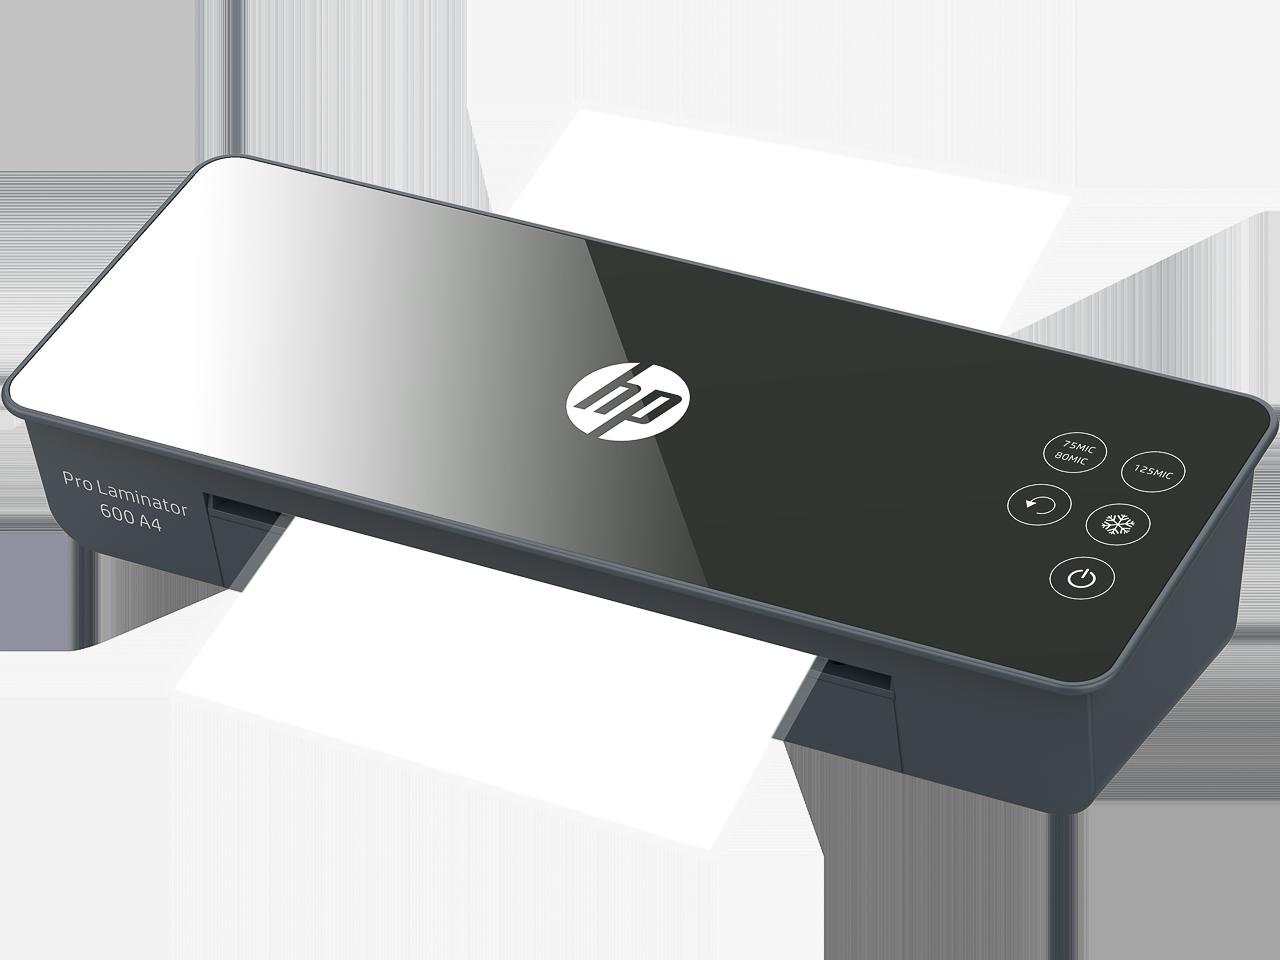 HP LAMINATOR PRO600 A4 3163 75-125µ black 1